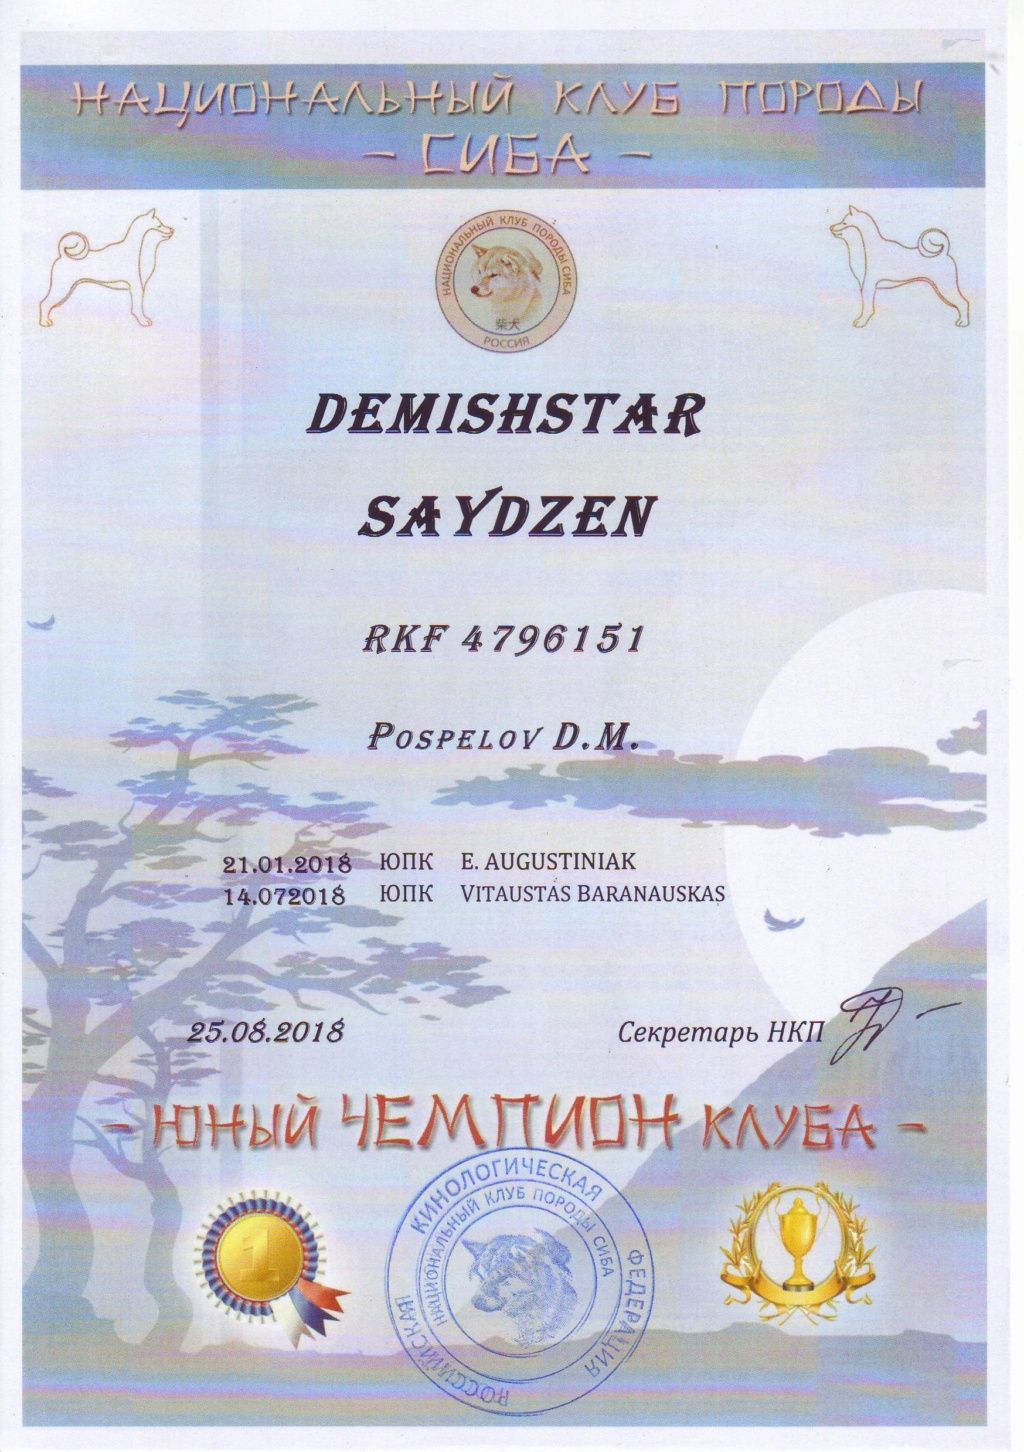 DEMISHSTAR SAYDZEN (Шмель) г. Москва Image011